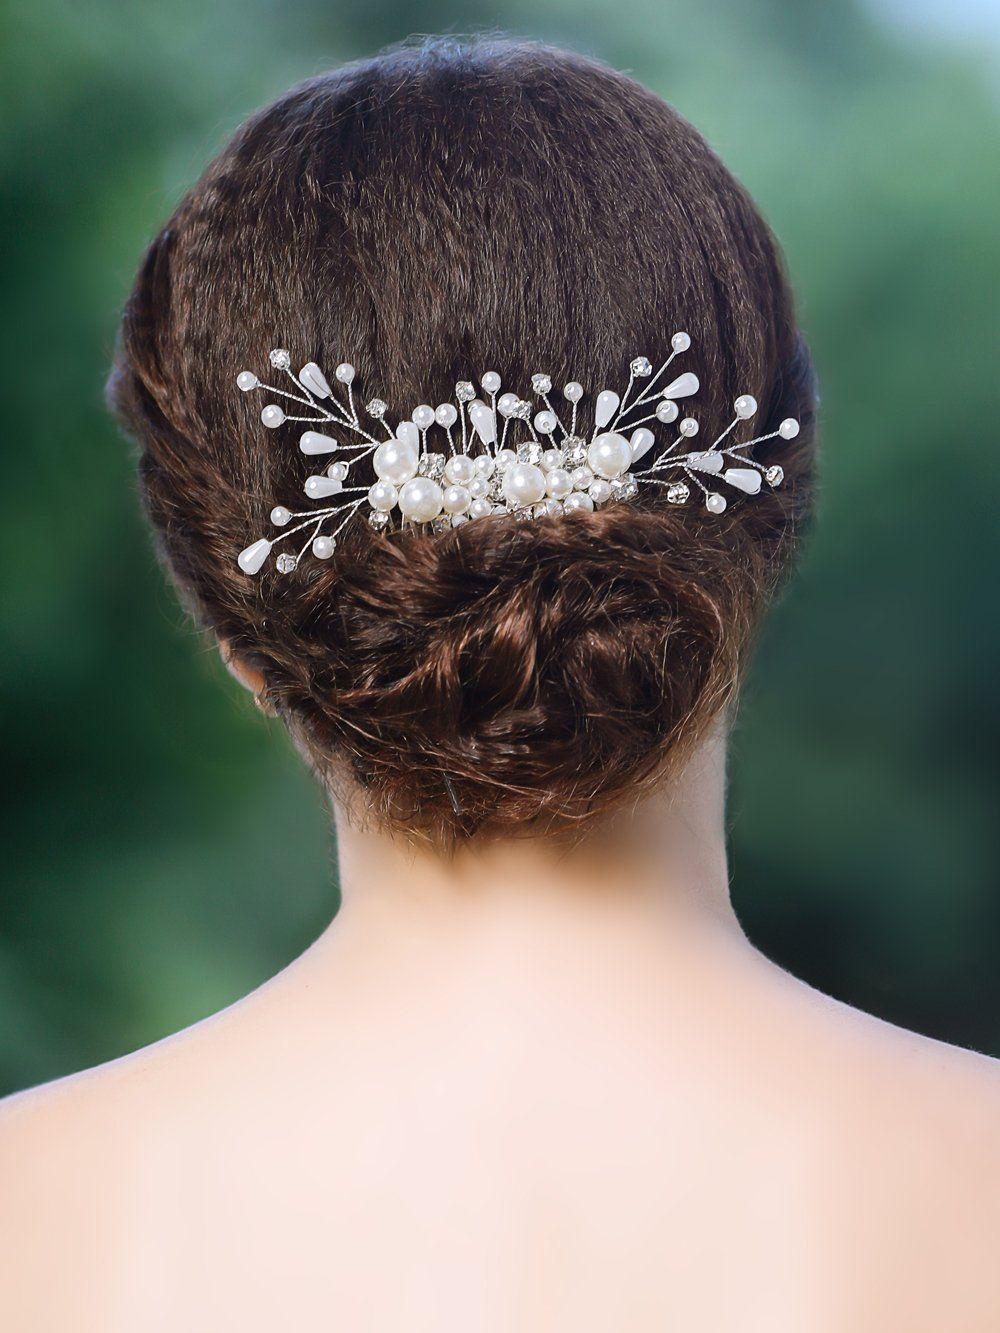 yean wedding hair combs bridal hair silver comb for bride